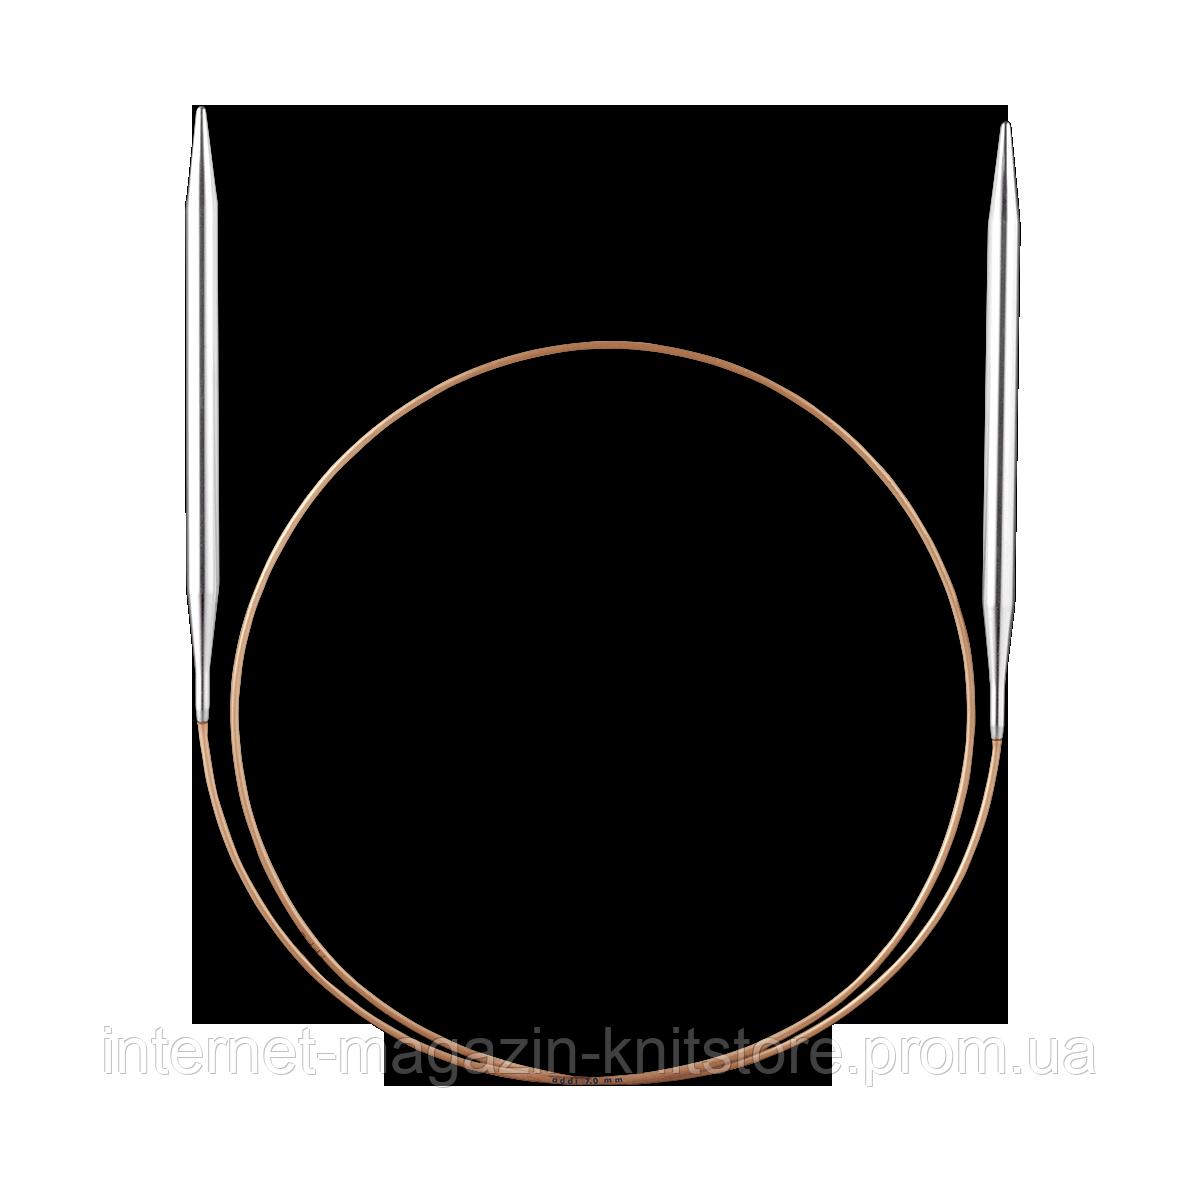 Спицы Addi 80 см/3.5 мм круговые